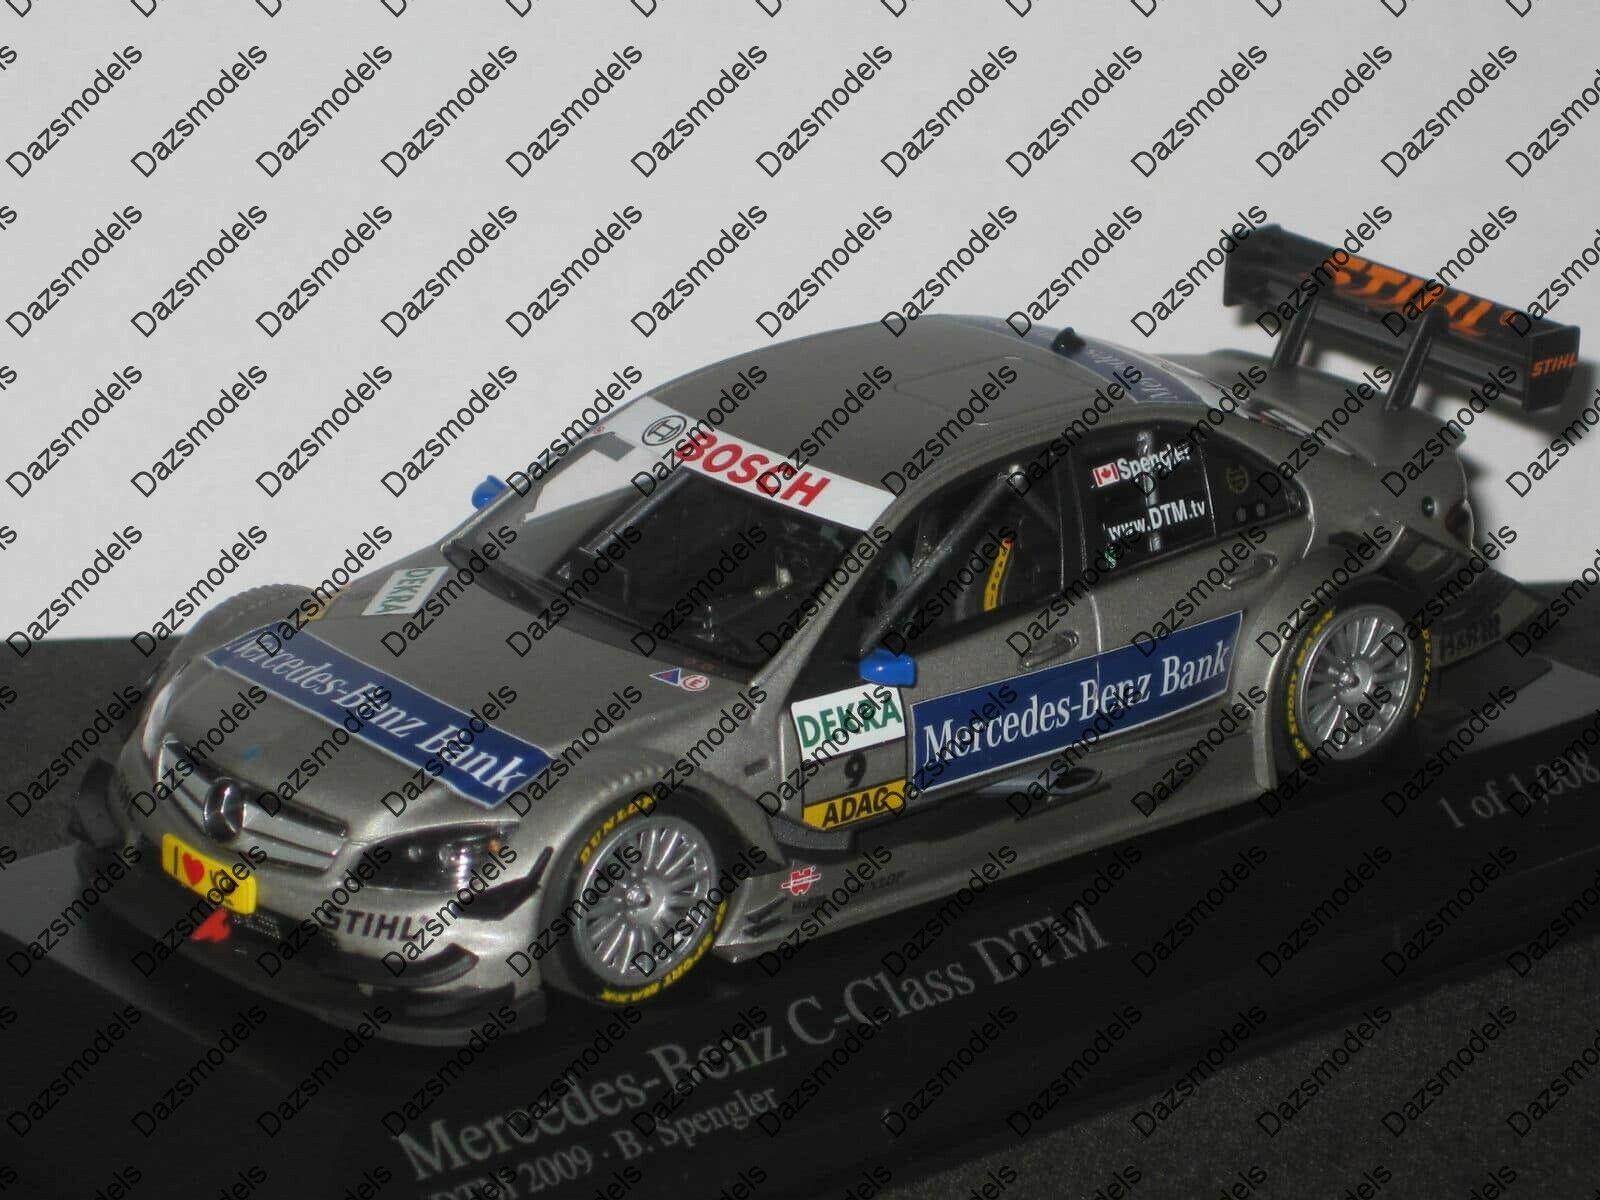 Minichamps Mercedes Classe C DTM 2009 B. Spengler  400 093909  en soldes